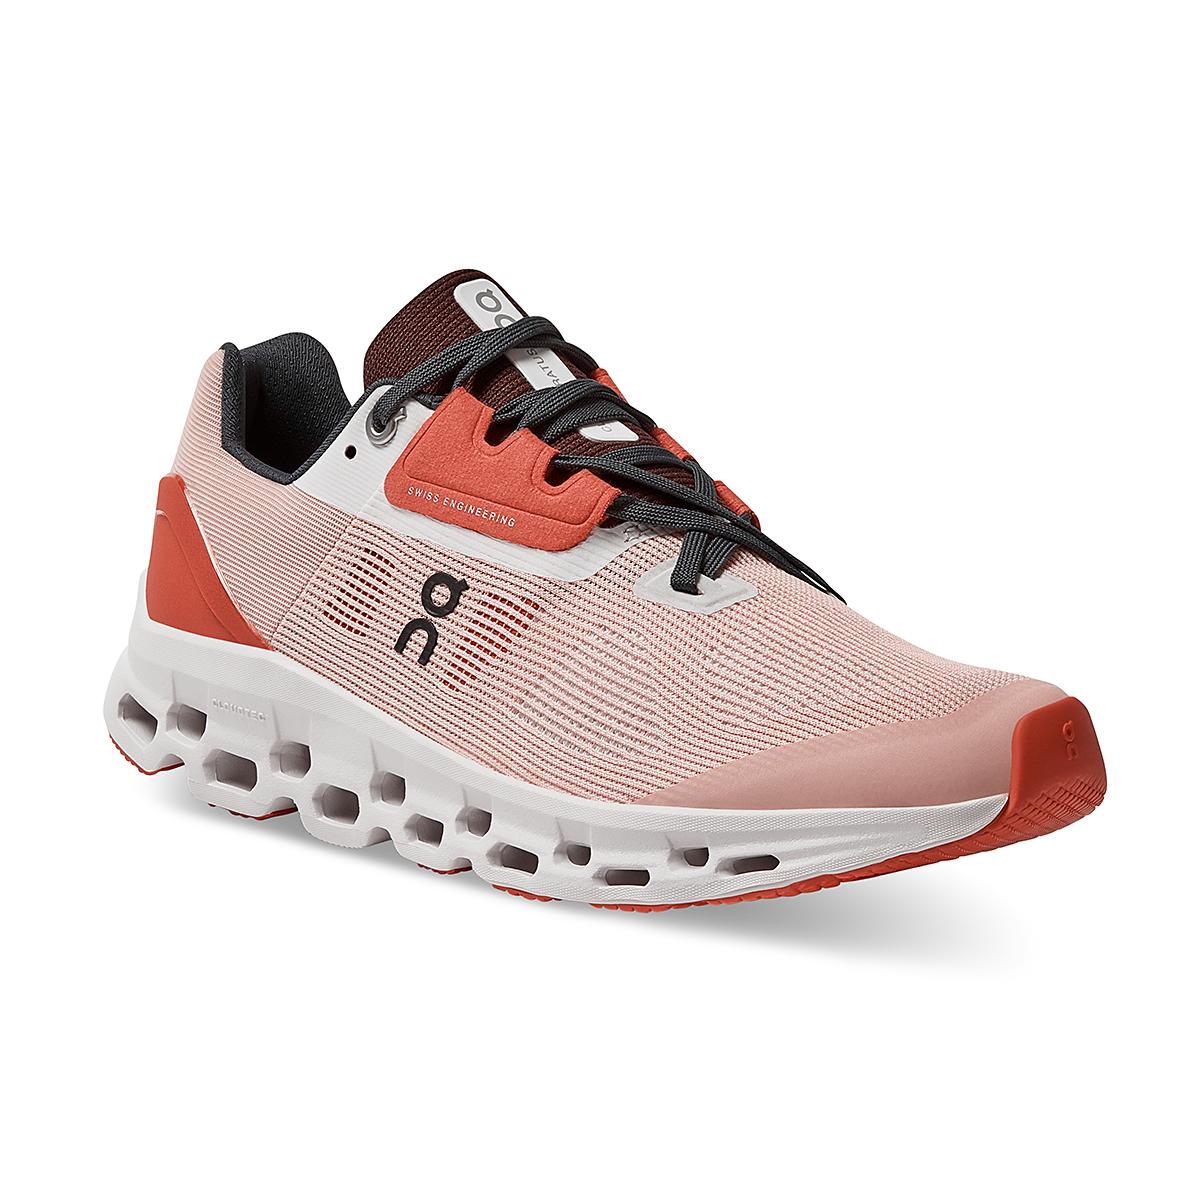 Women's On Cloudstratus 2.0 Running Shoe - Color: Rose/Red - Size: 5 - Width: Regular, Rose/Red, large, image 2